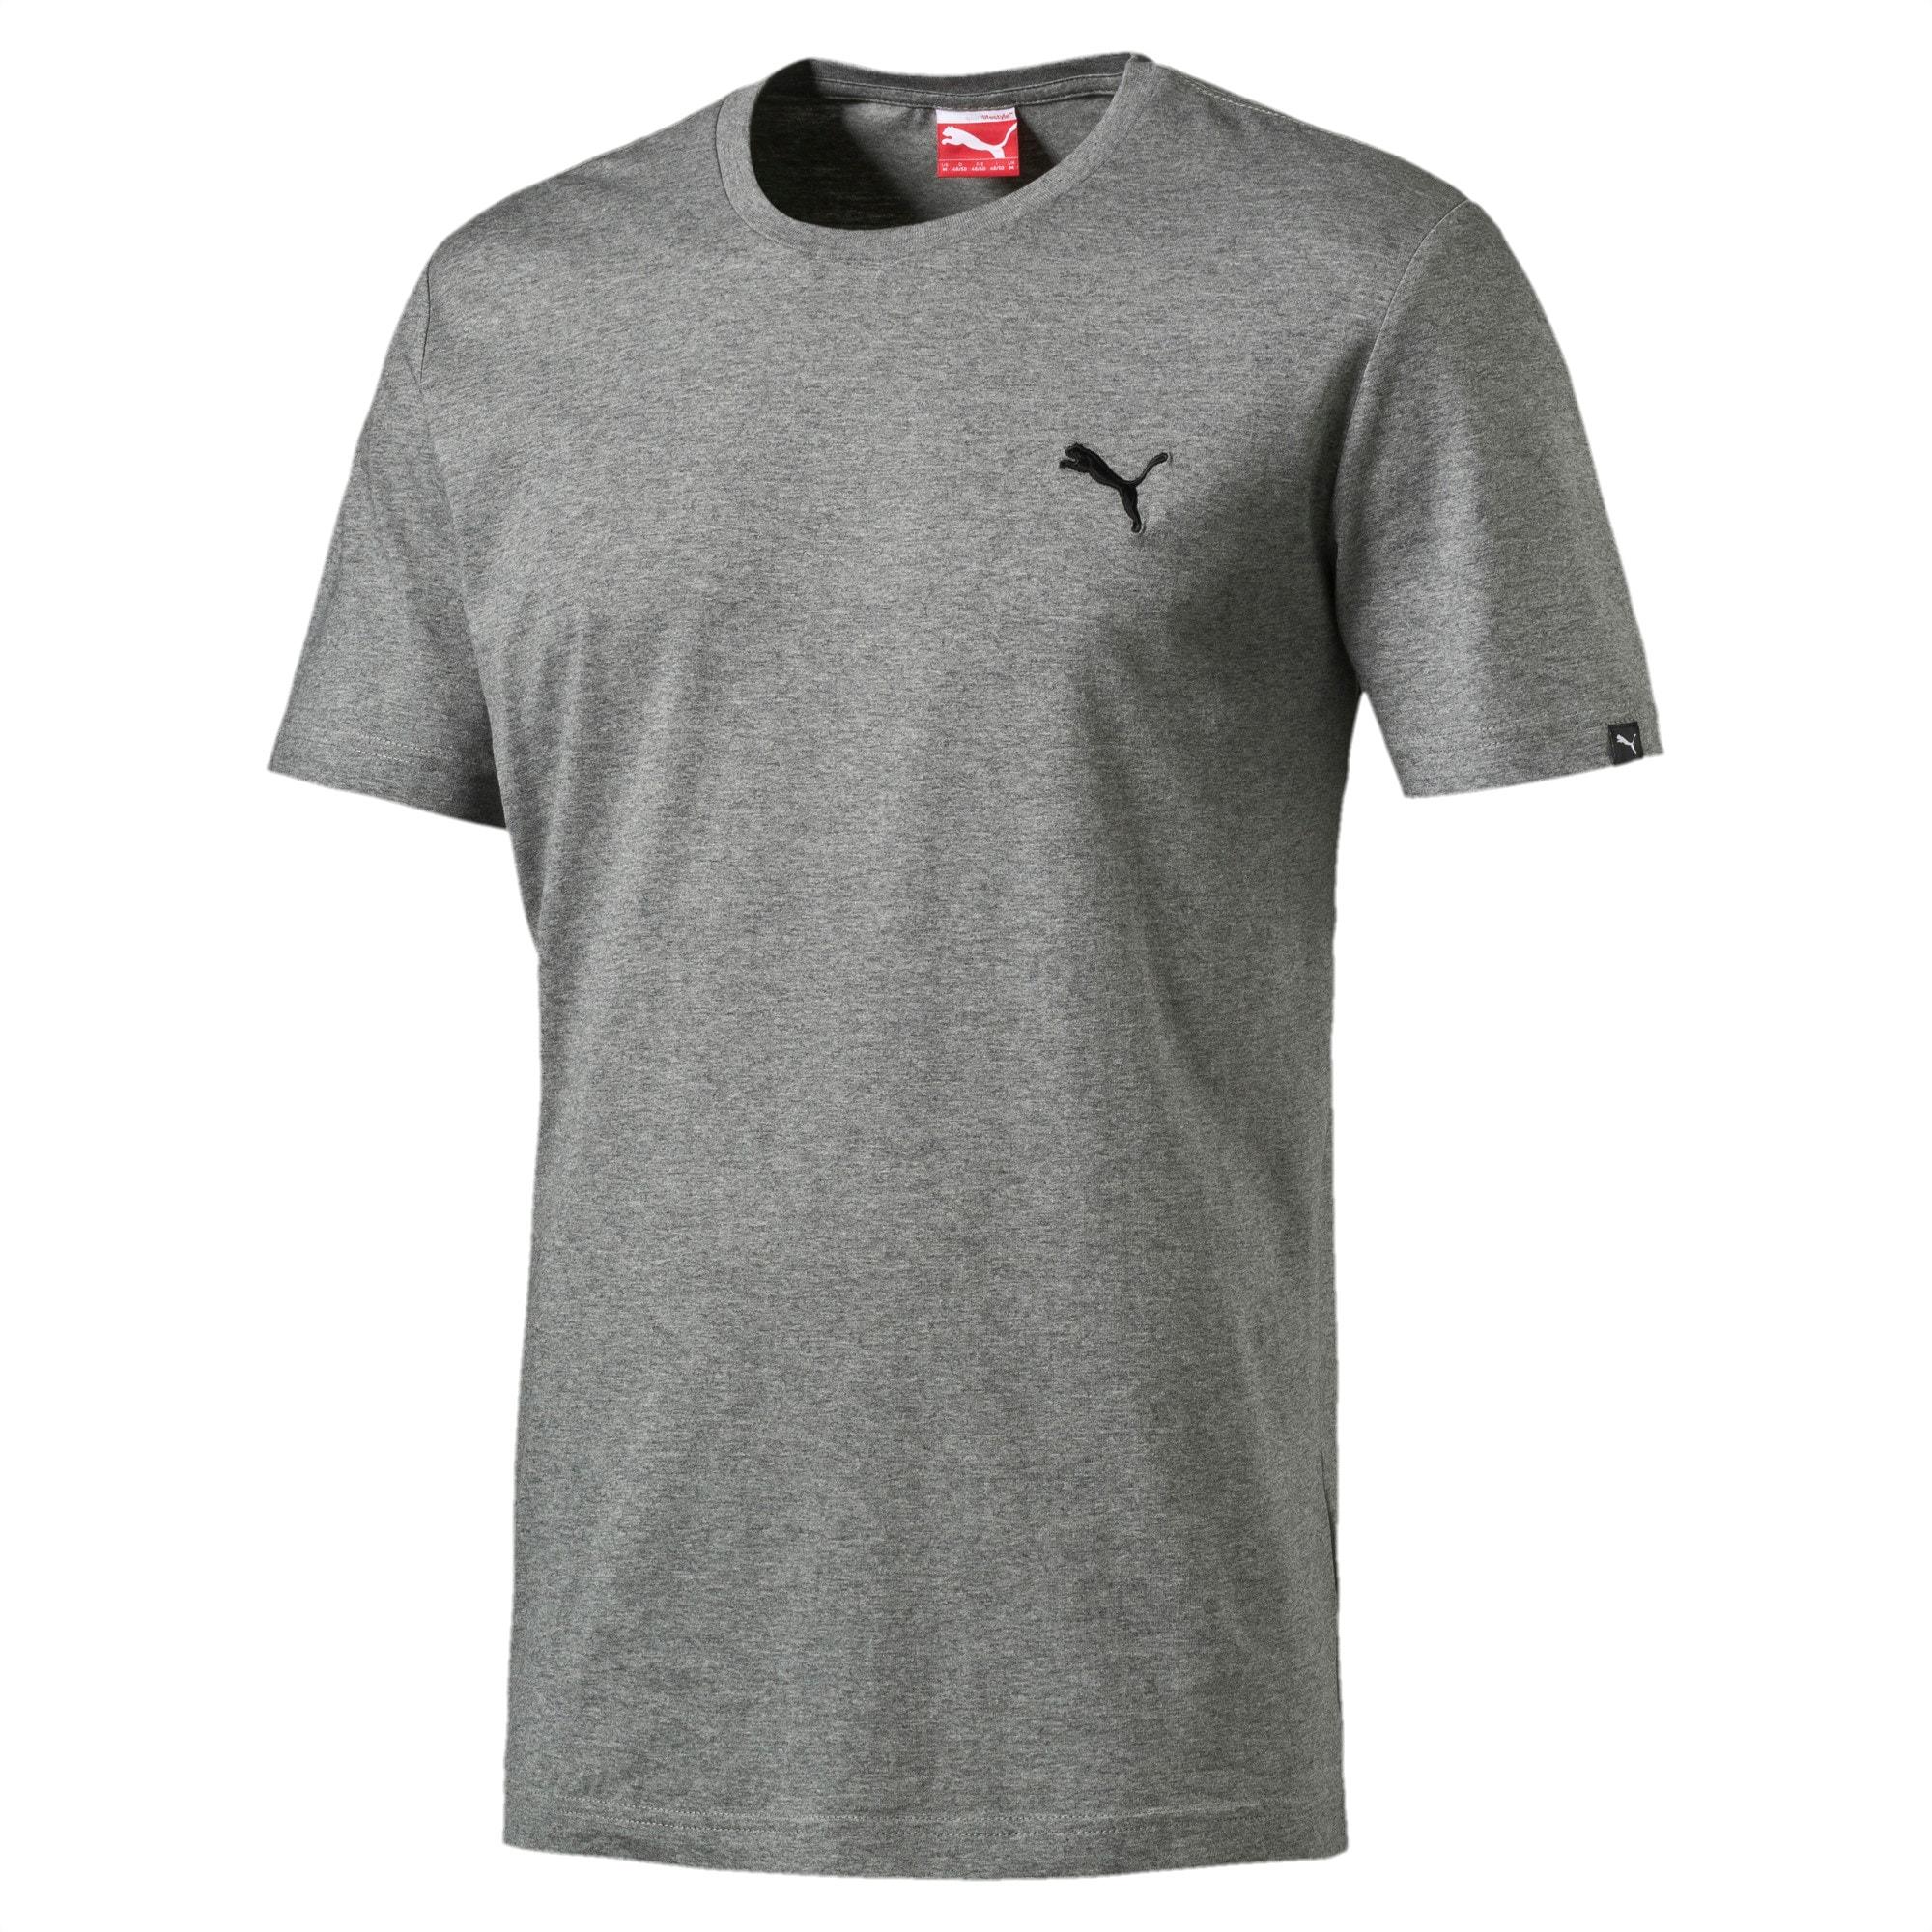 Classic PUMA dryCELL T-Shirt